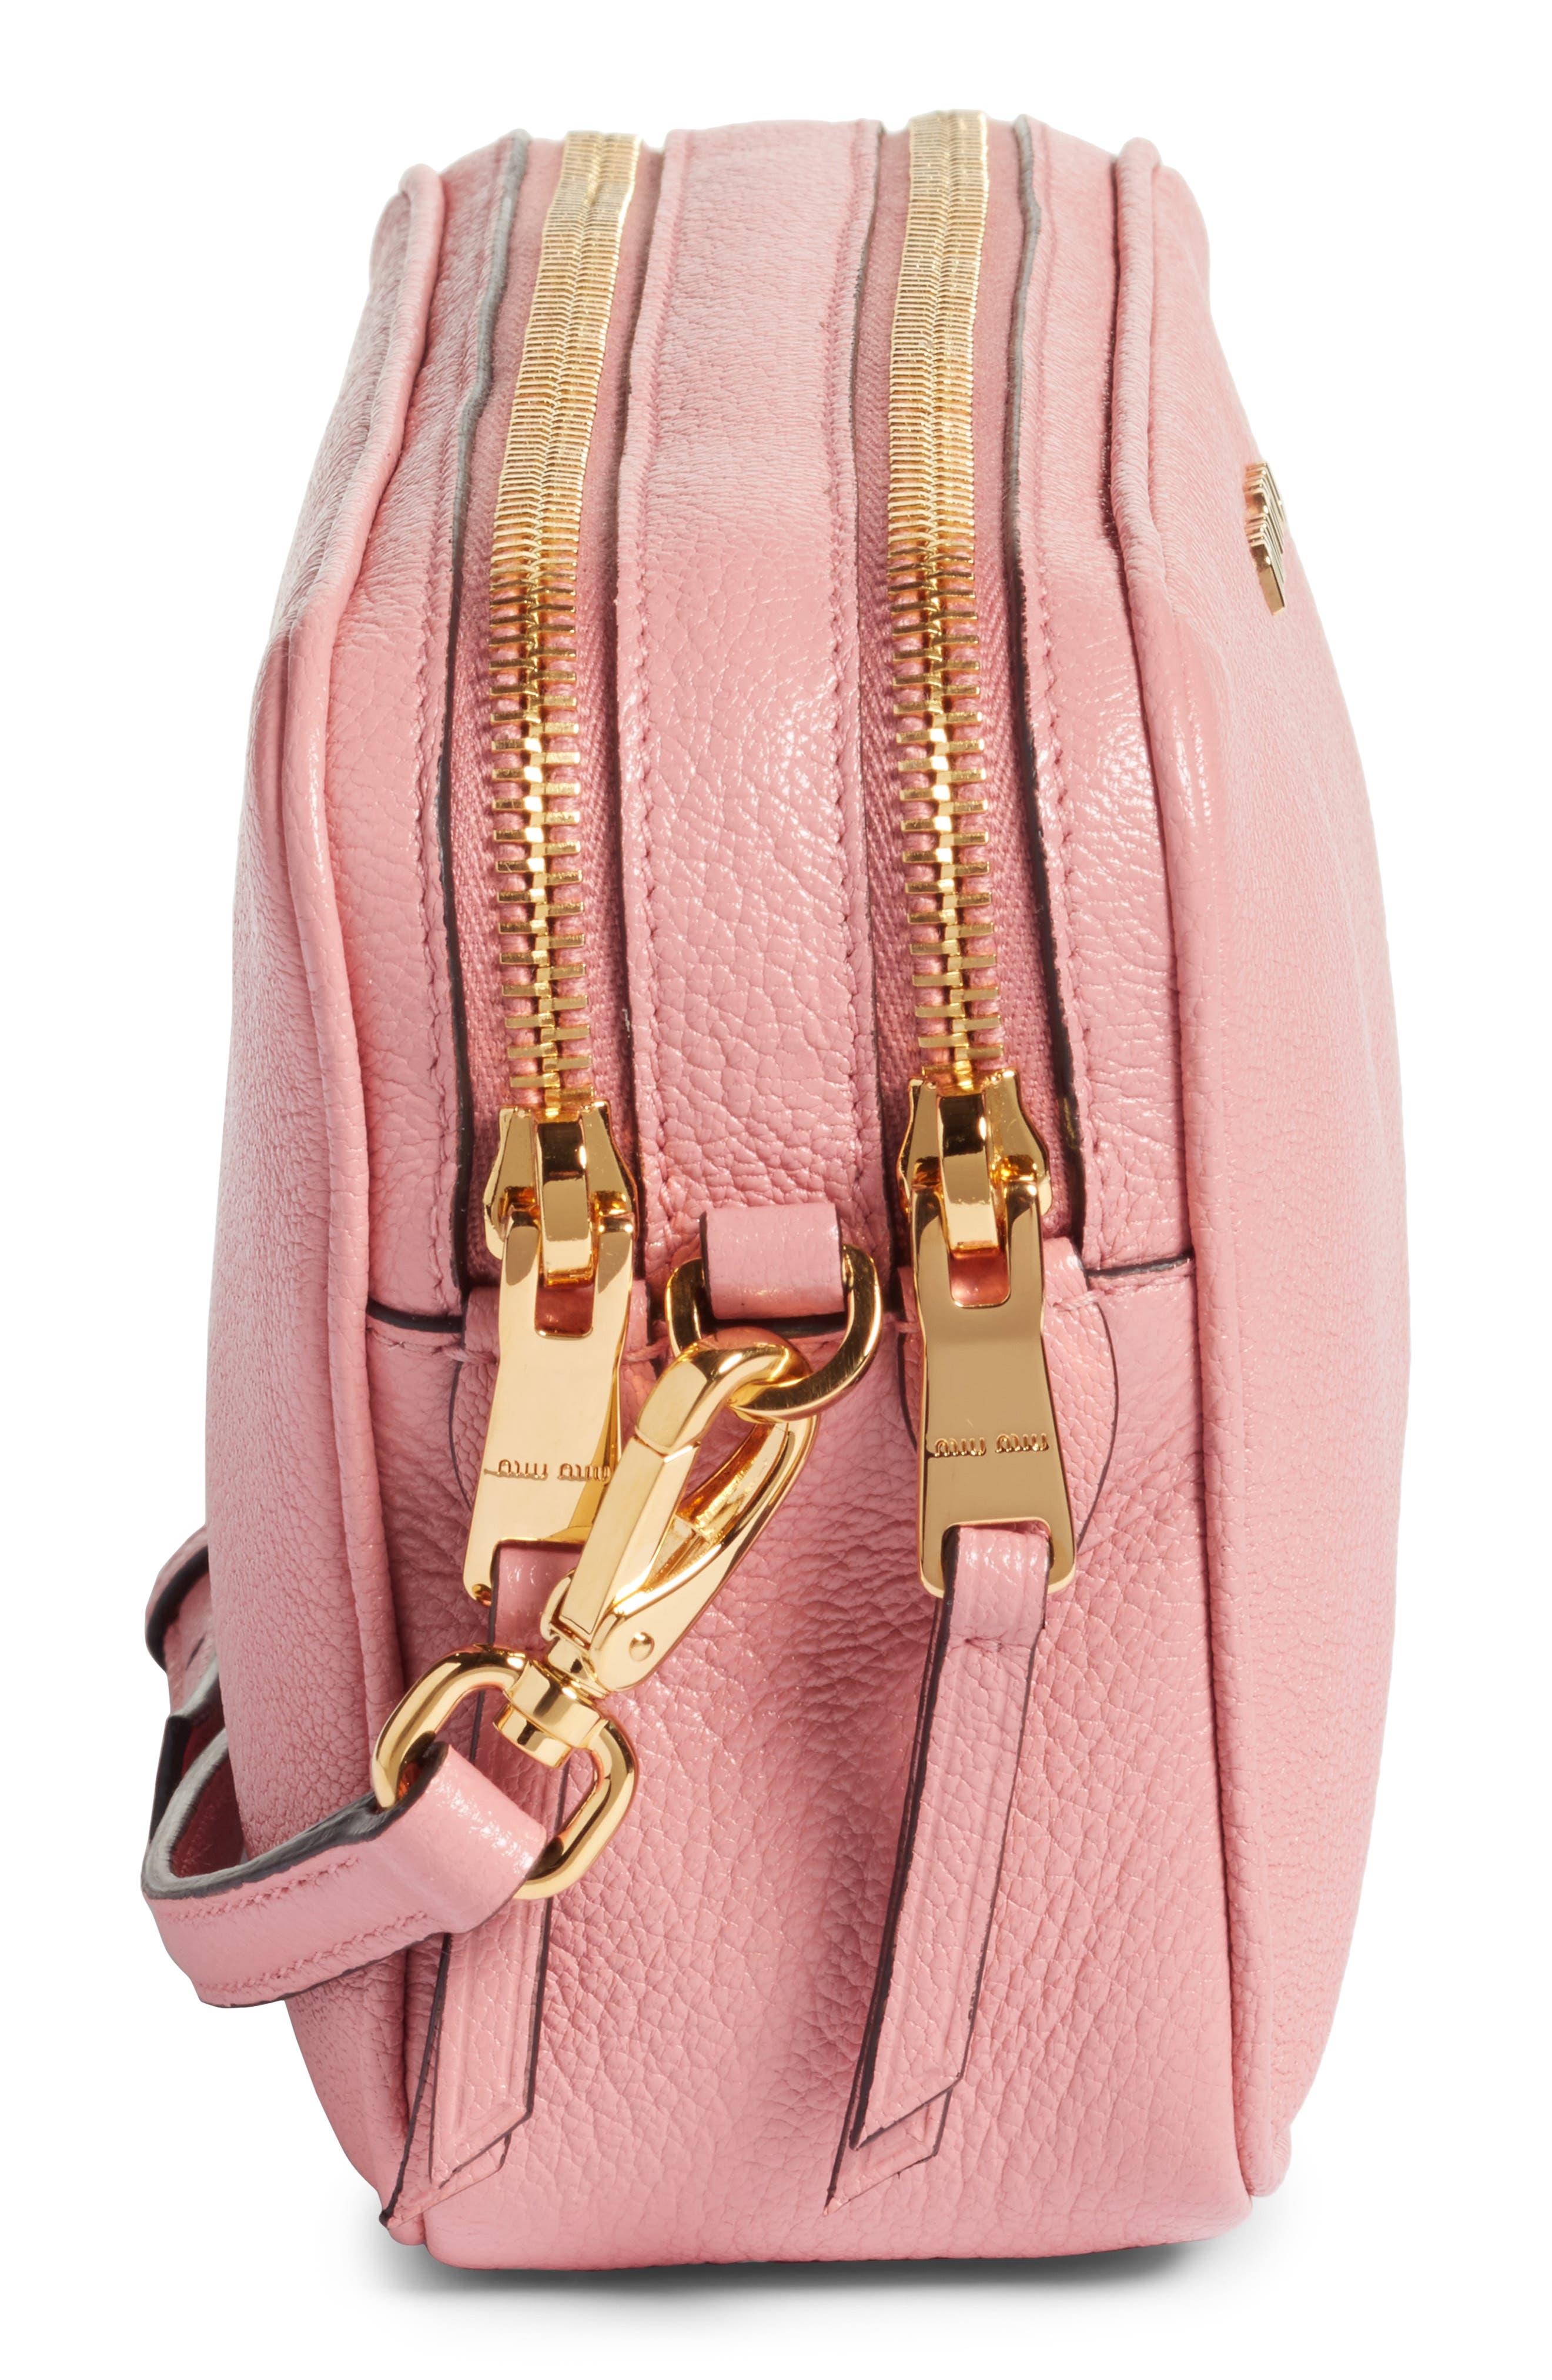 Madras Goatskin Leather Crossbody Bag,                             Alternate thumbnail 5, color,